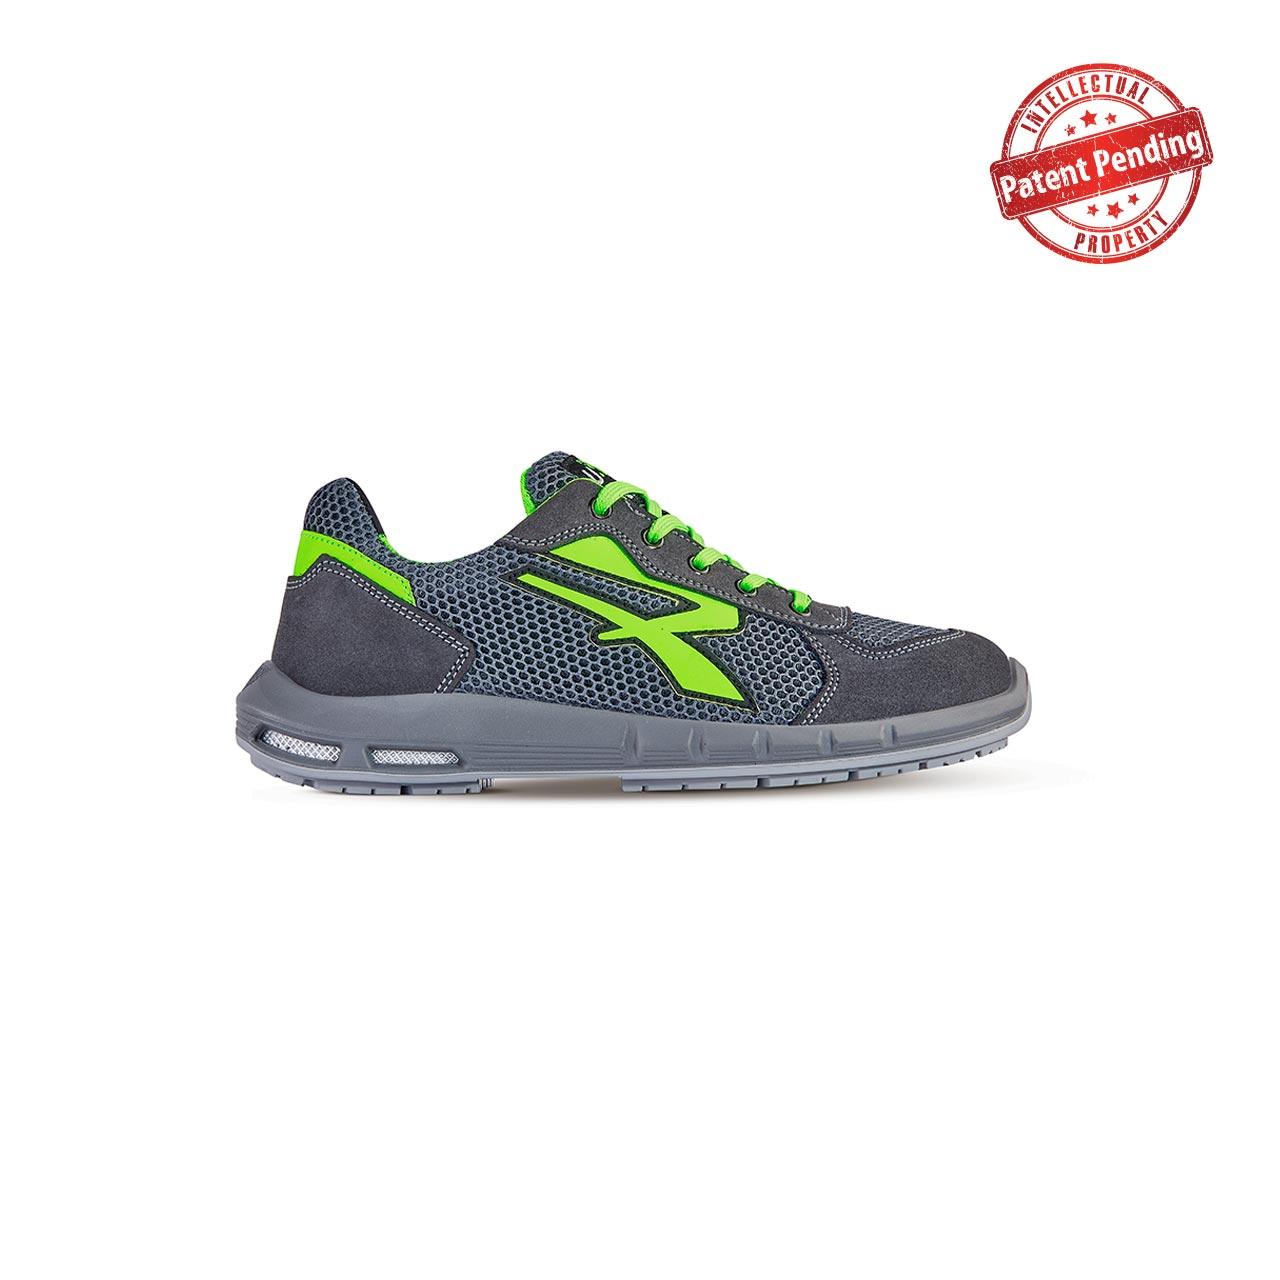 scarpa antinfortunistica upower modello gemini plus linea redup plus vista laterale